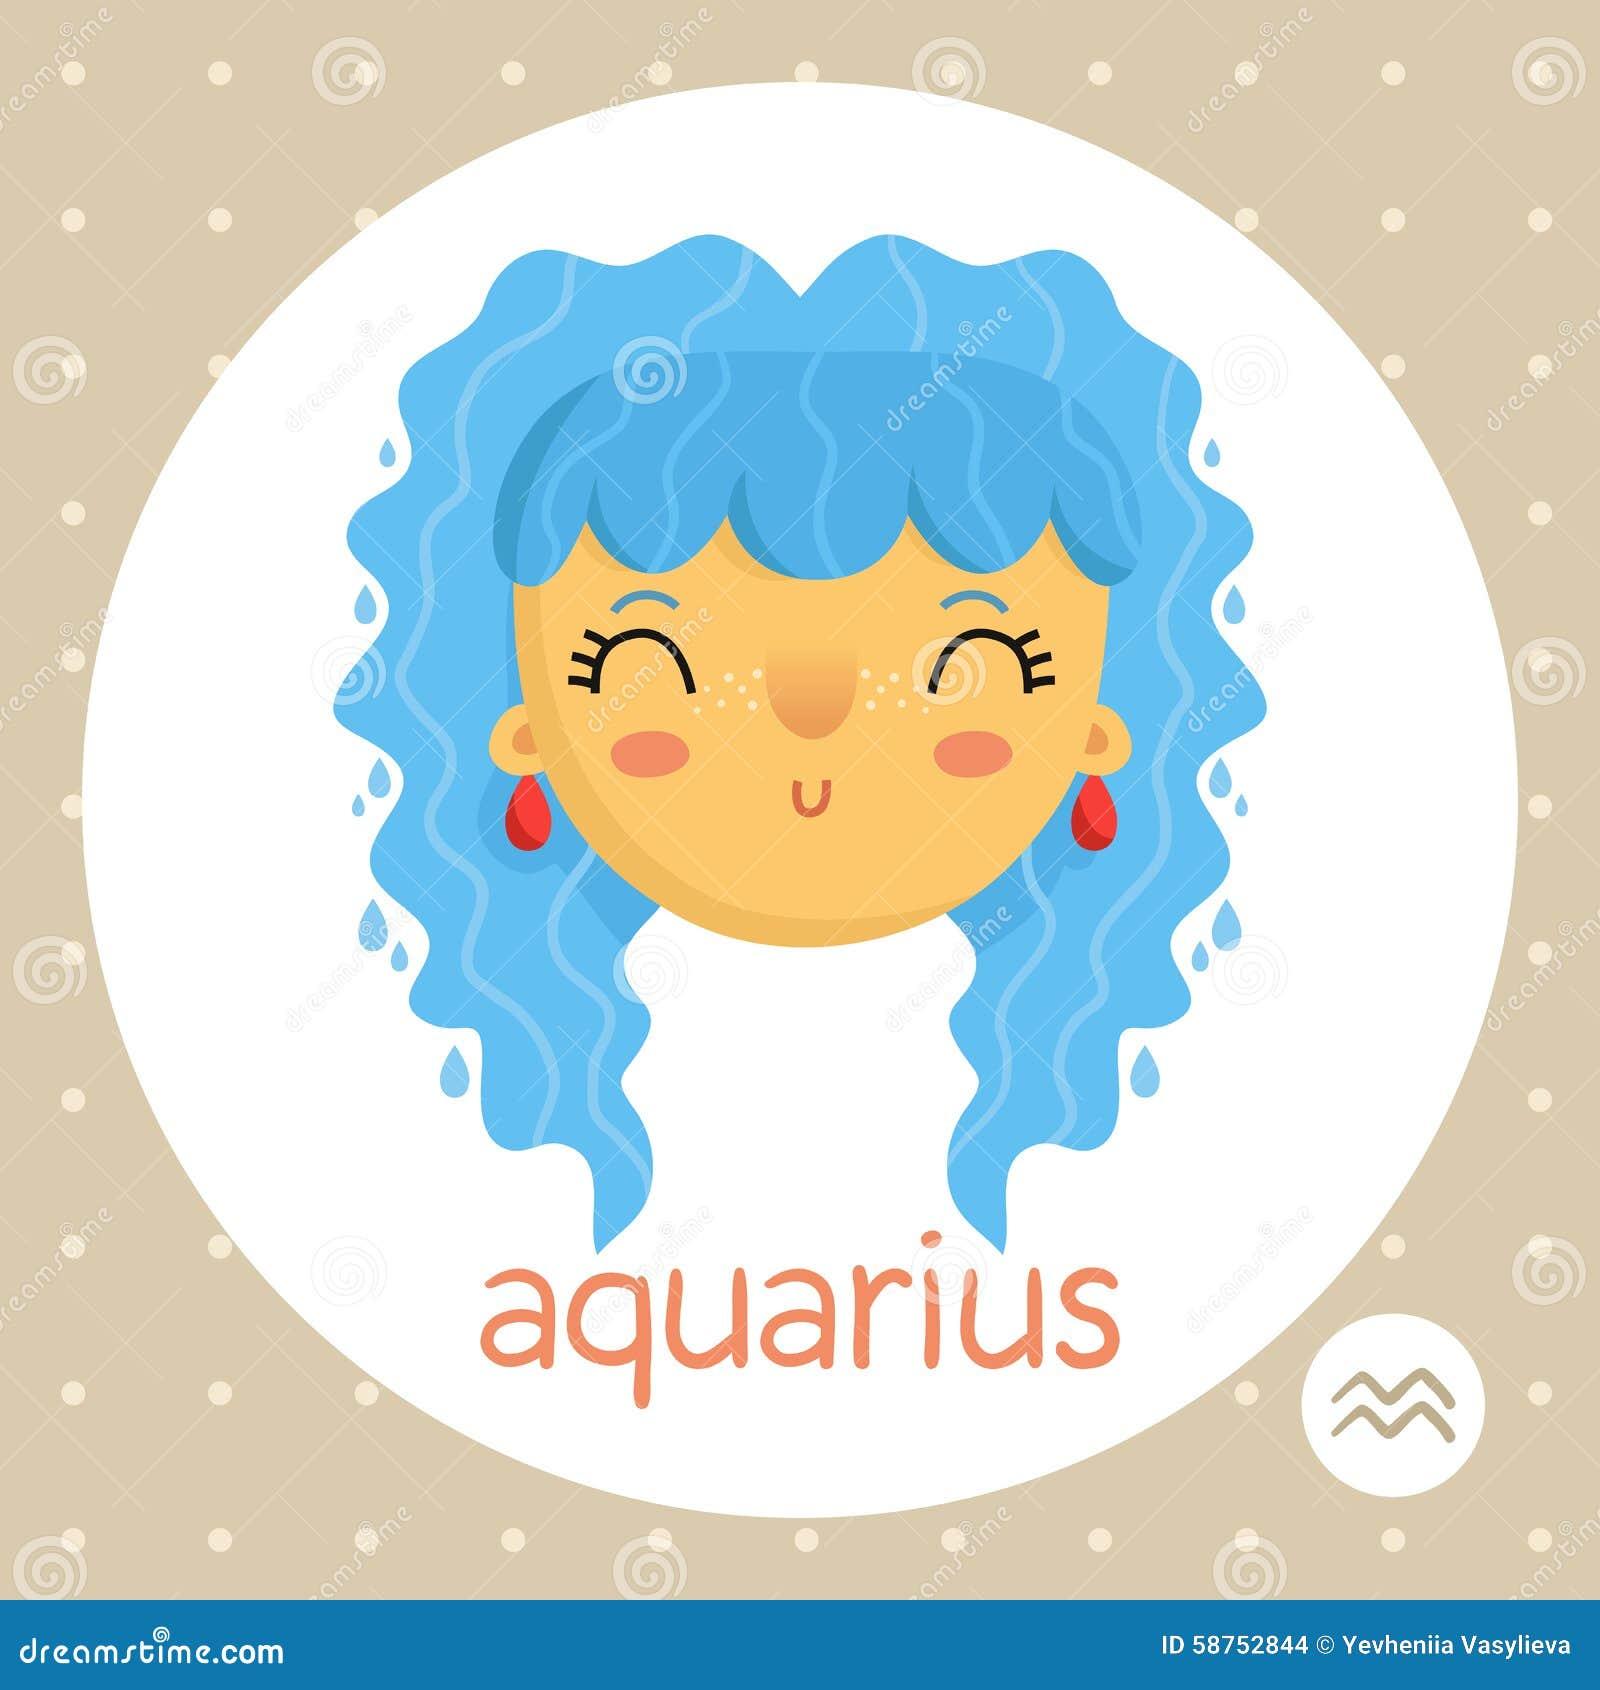 Aquarius zodiac sign girl with water drops stock vector aquarius zodiac sign girl with water drops buycottarizona